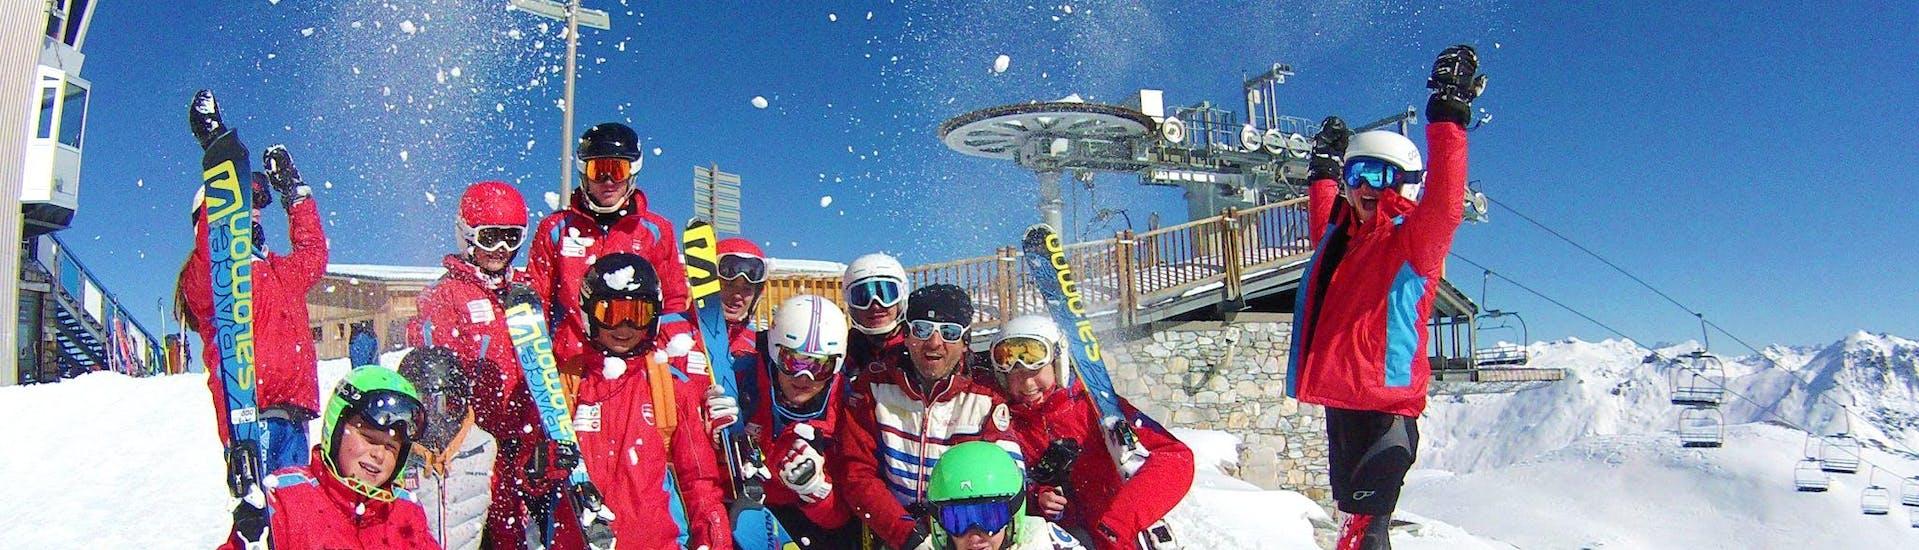 Cours de ski pour Ados (13-18 ans) - Matin - Vacances